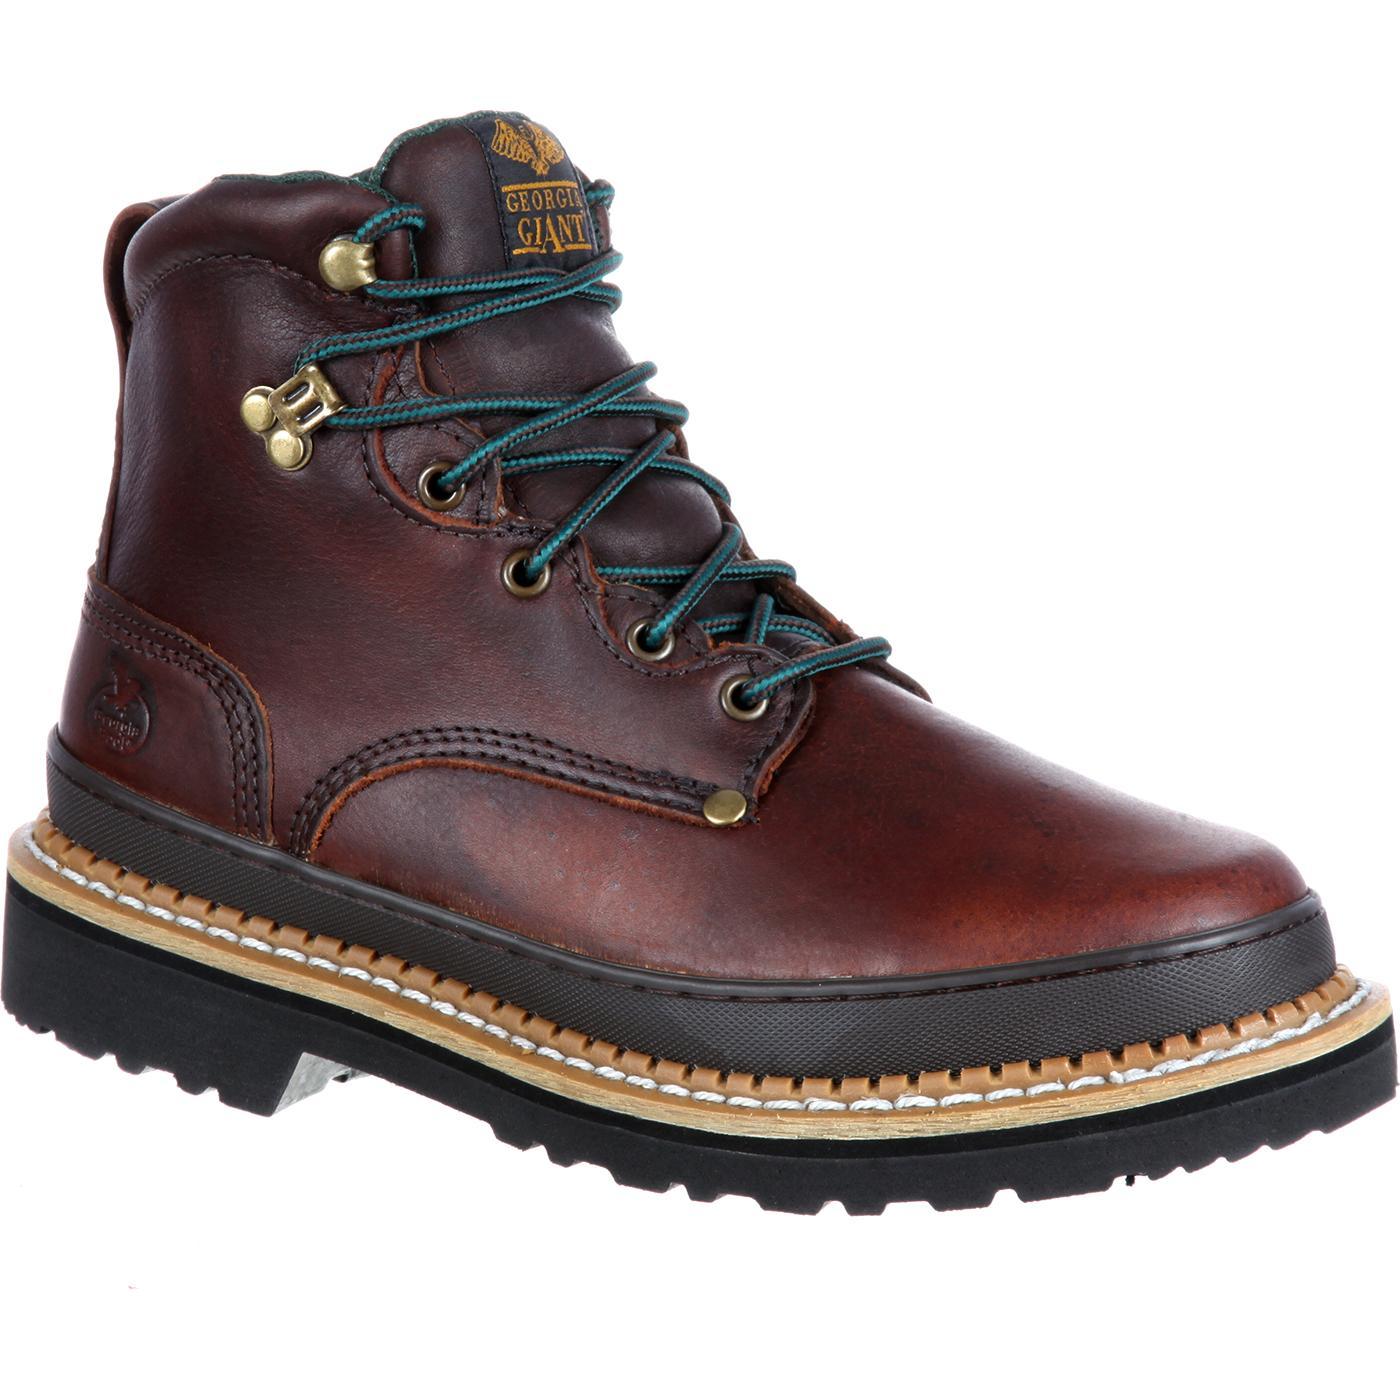 d2e5b4dccce Georgia Giant Steel Toe Work Boot